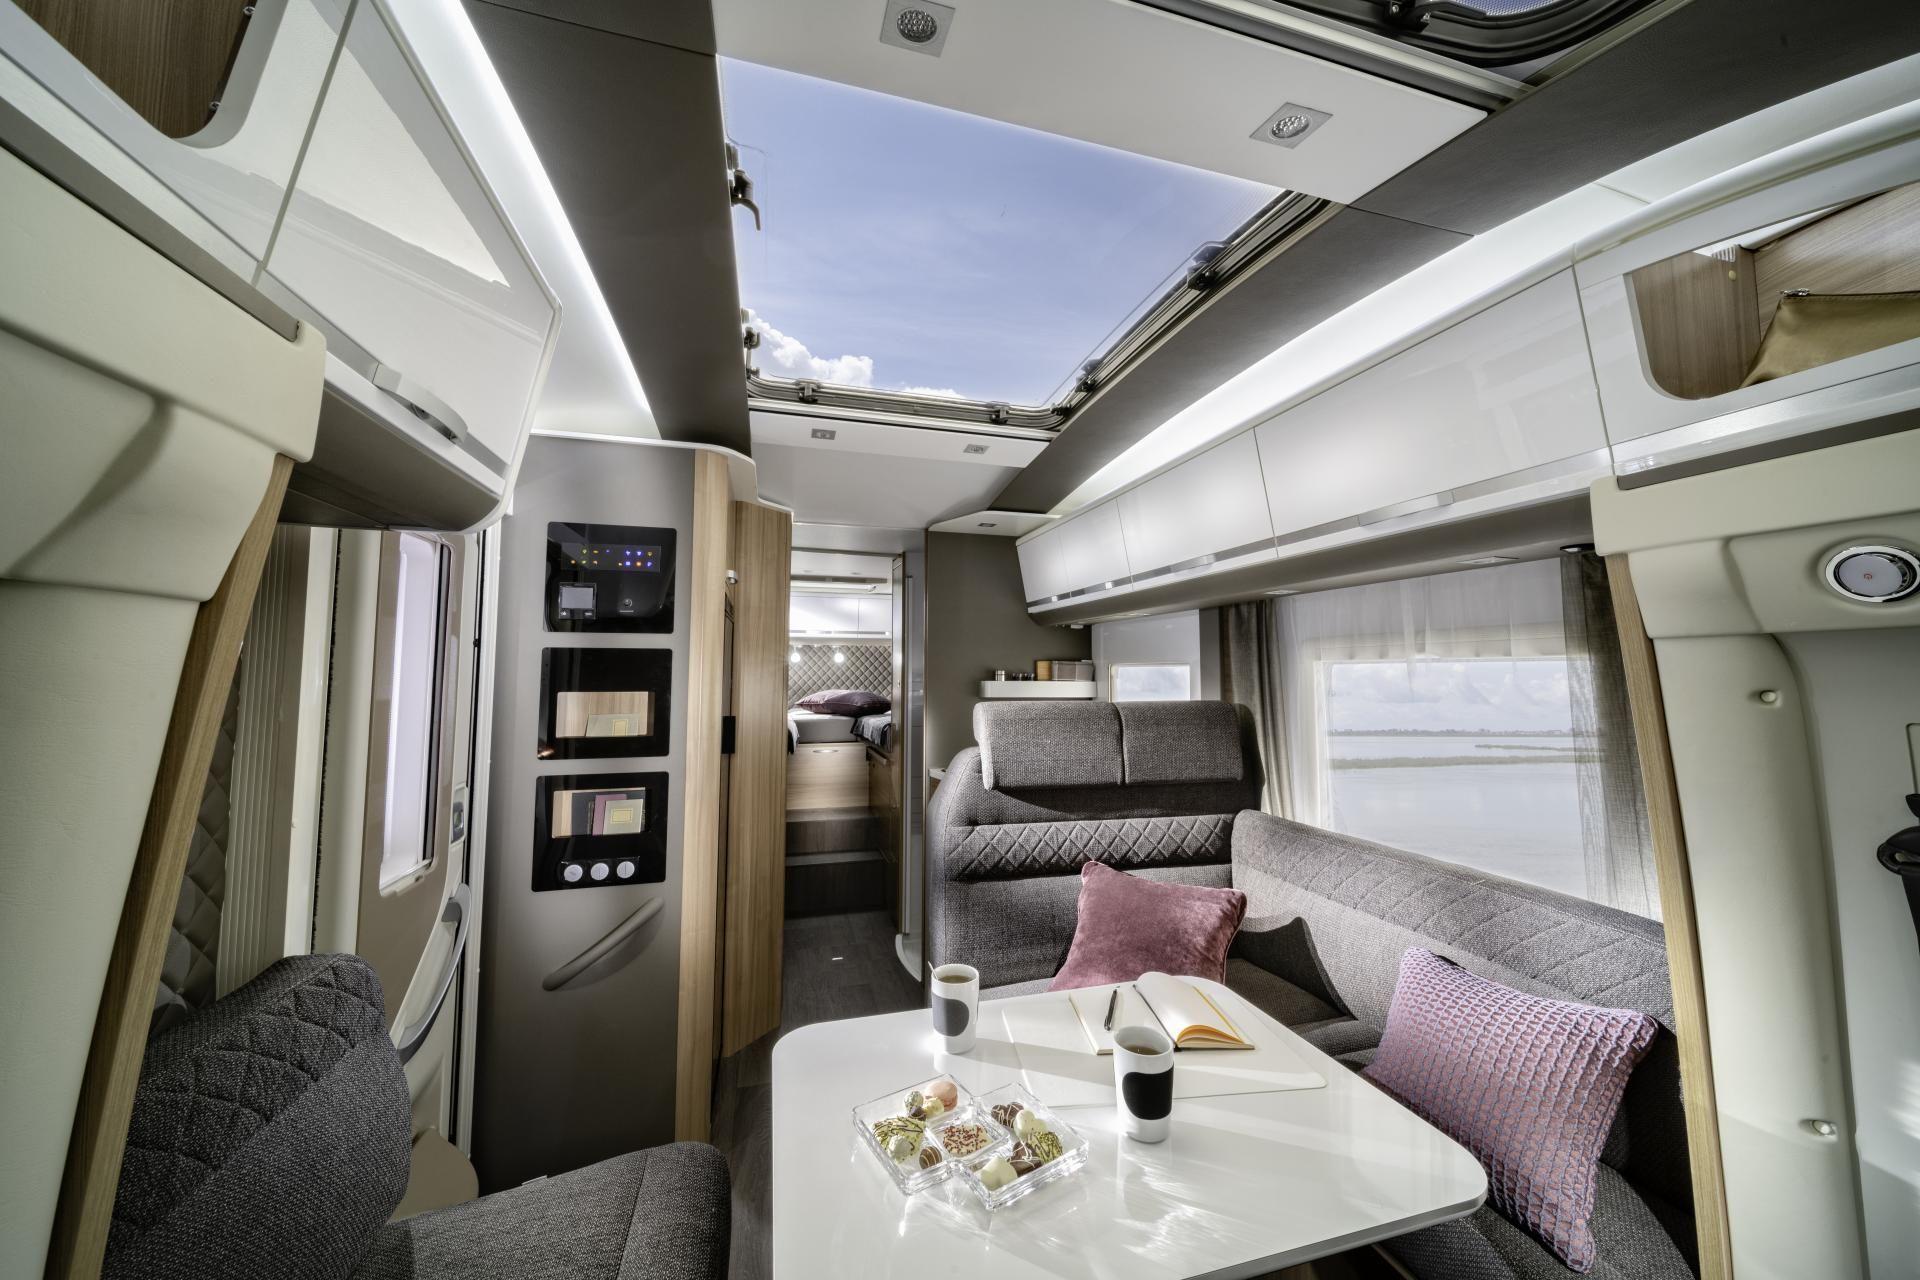 670 DL » Coral » Motorhomes » Adria Mobil | Campervans, RV